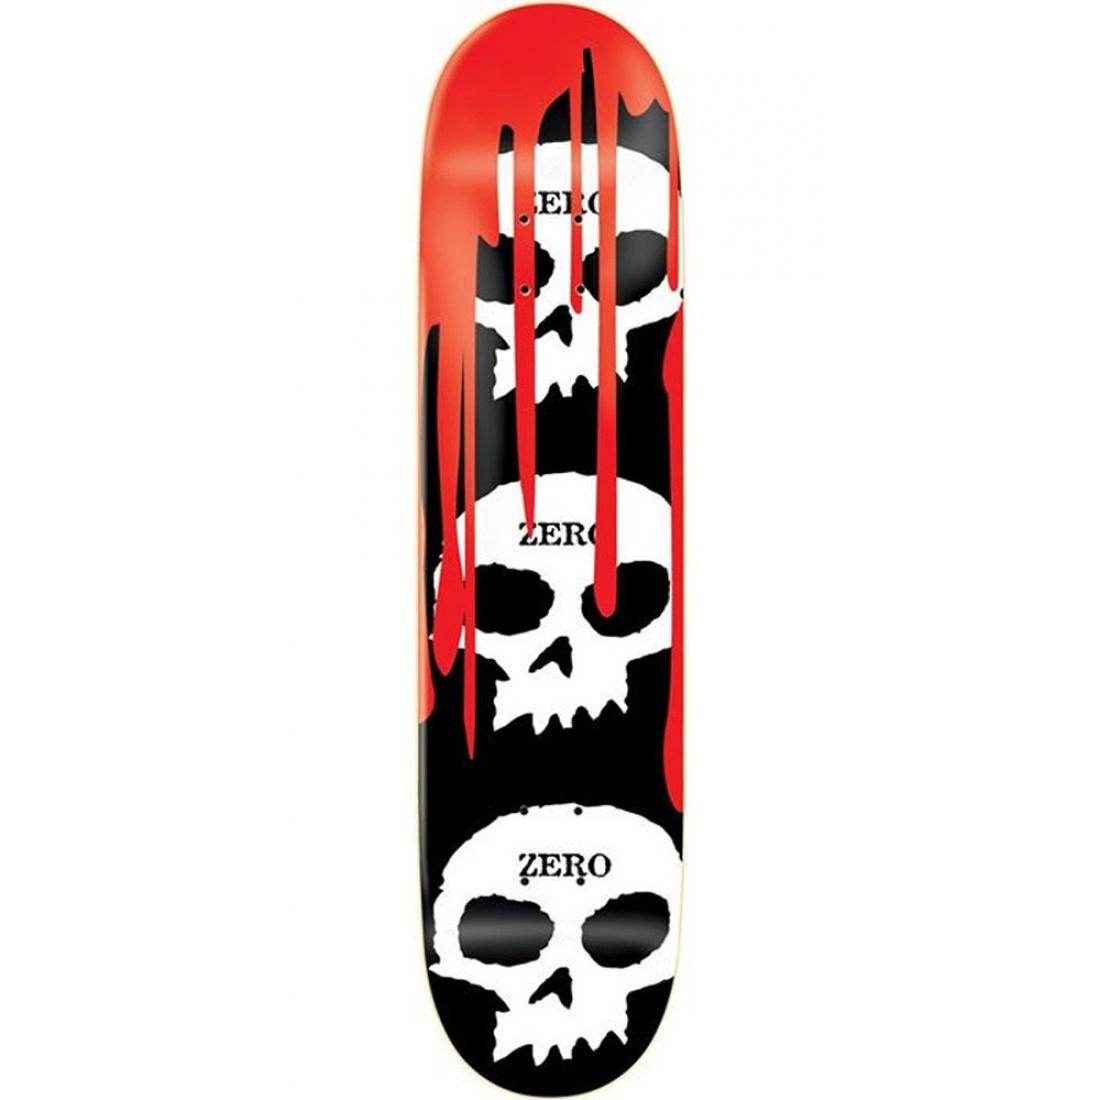 ZER-3 Skull Blood Black R7 8.125 Deck